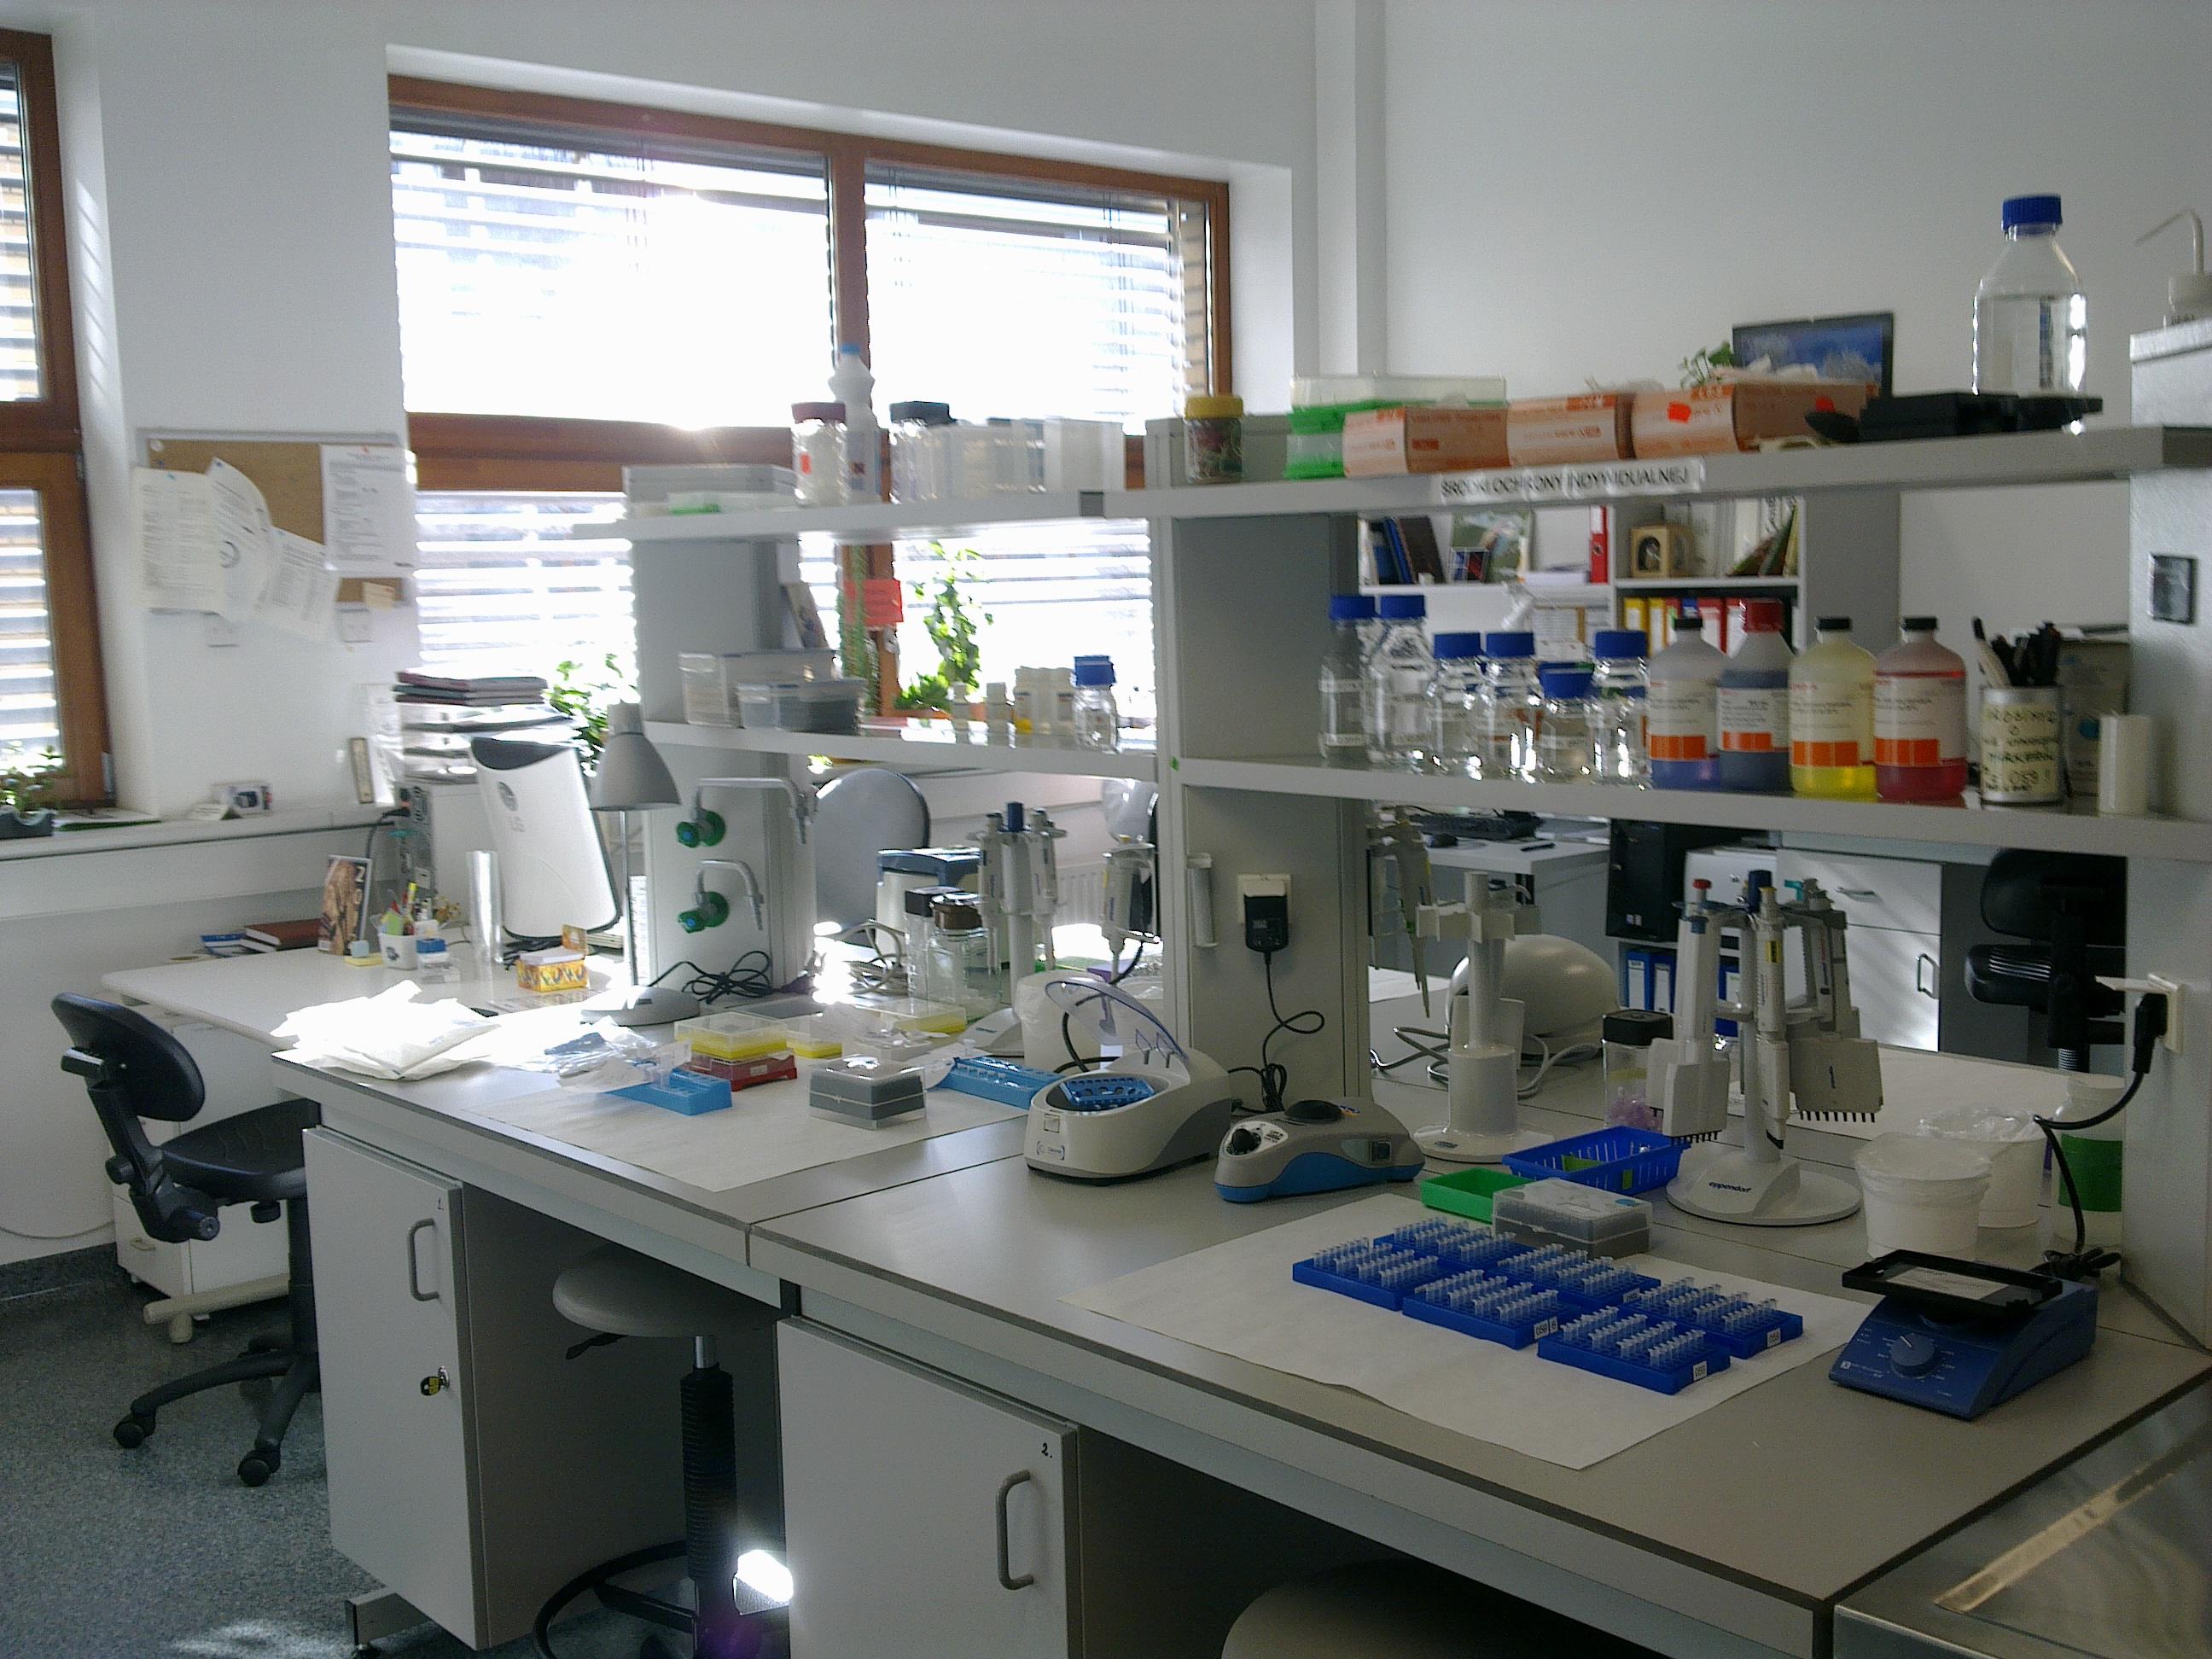 Download [PDF] Basic Bioscience Laboratory Techniques Free ...